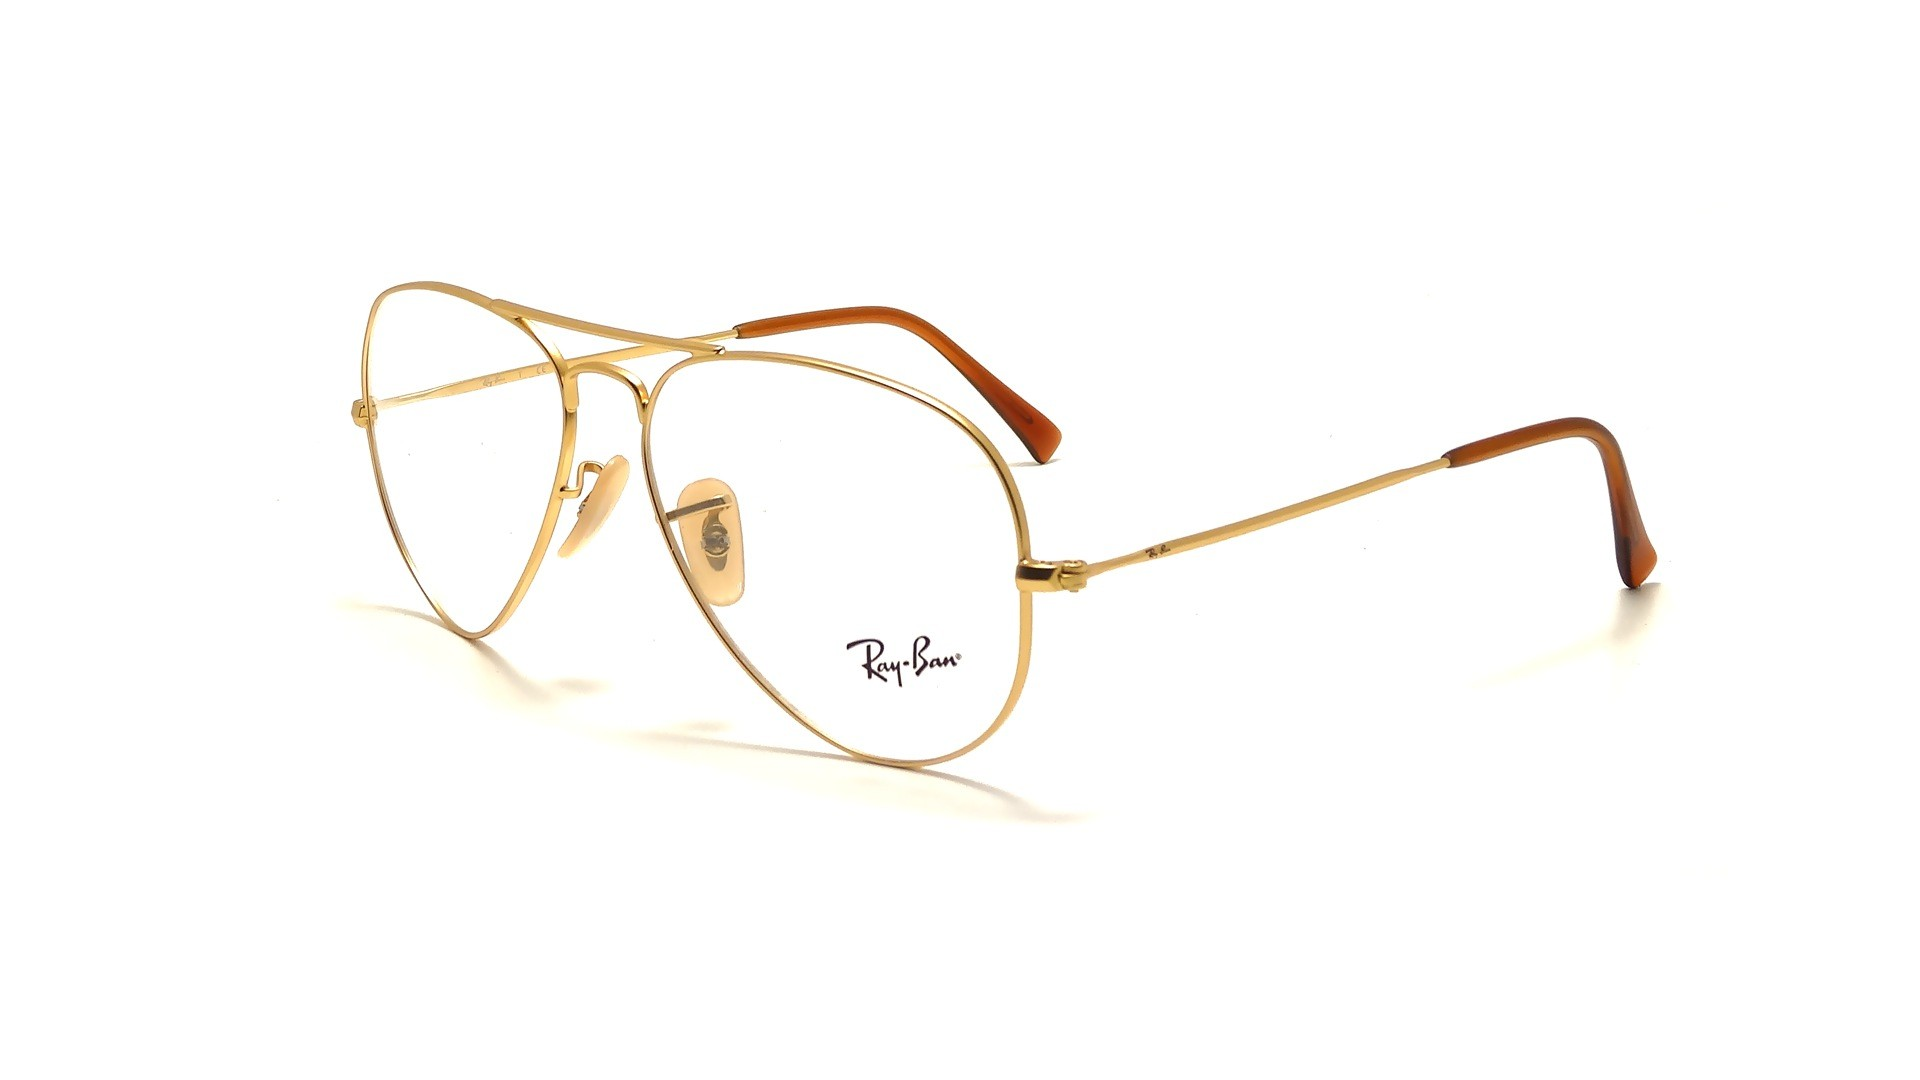 633c473ea11 Ray Ban Metal Eyeglasses Frames. ray ban round optical glasses. Ray Ban  Memory Metal Frame